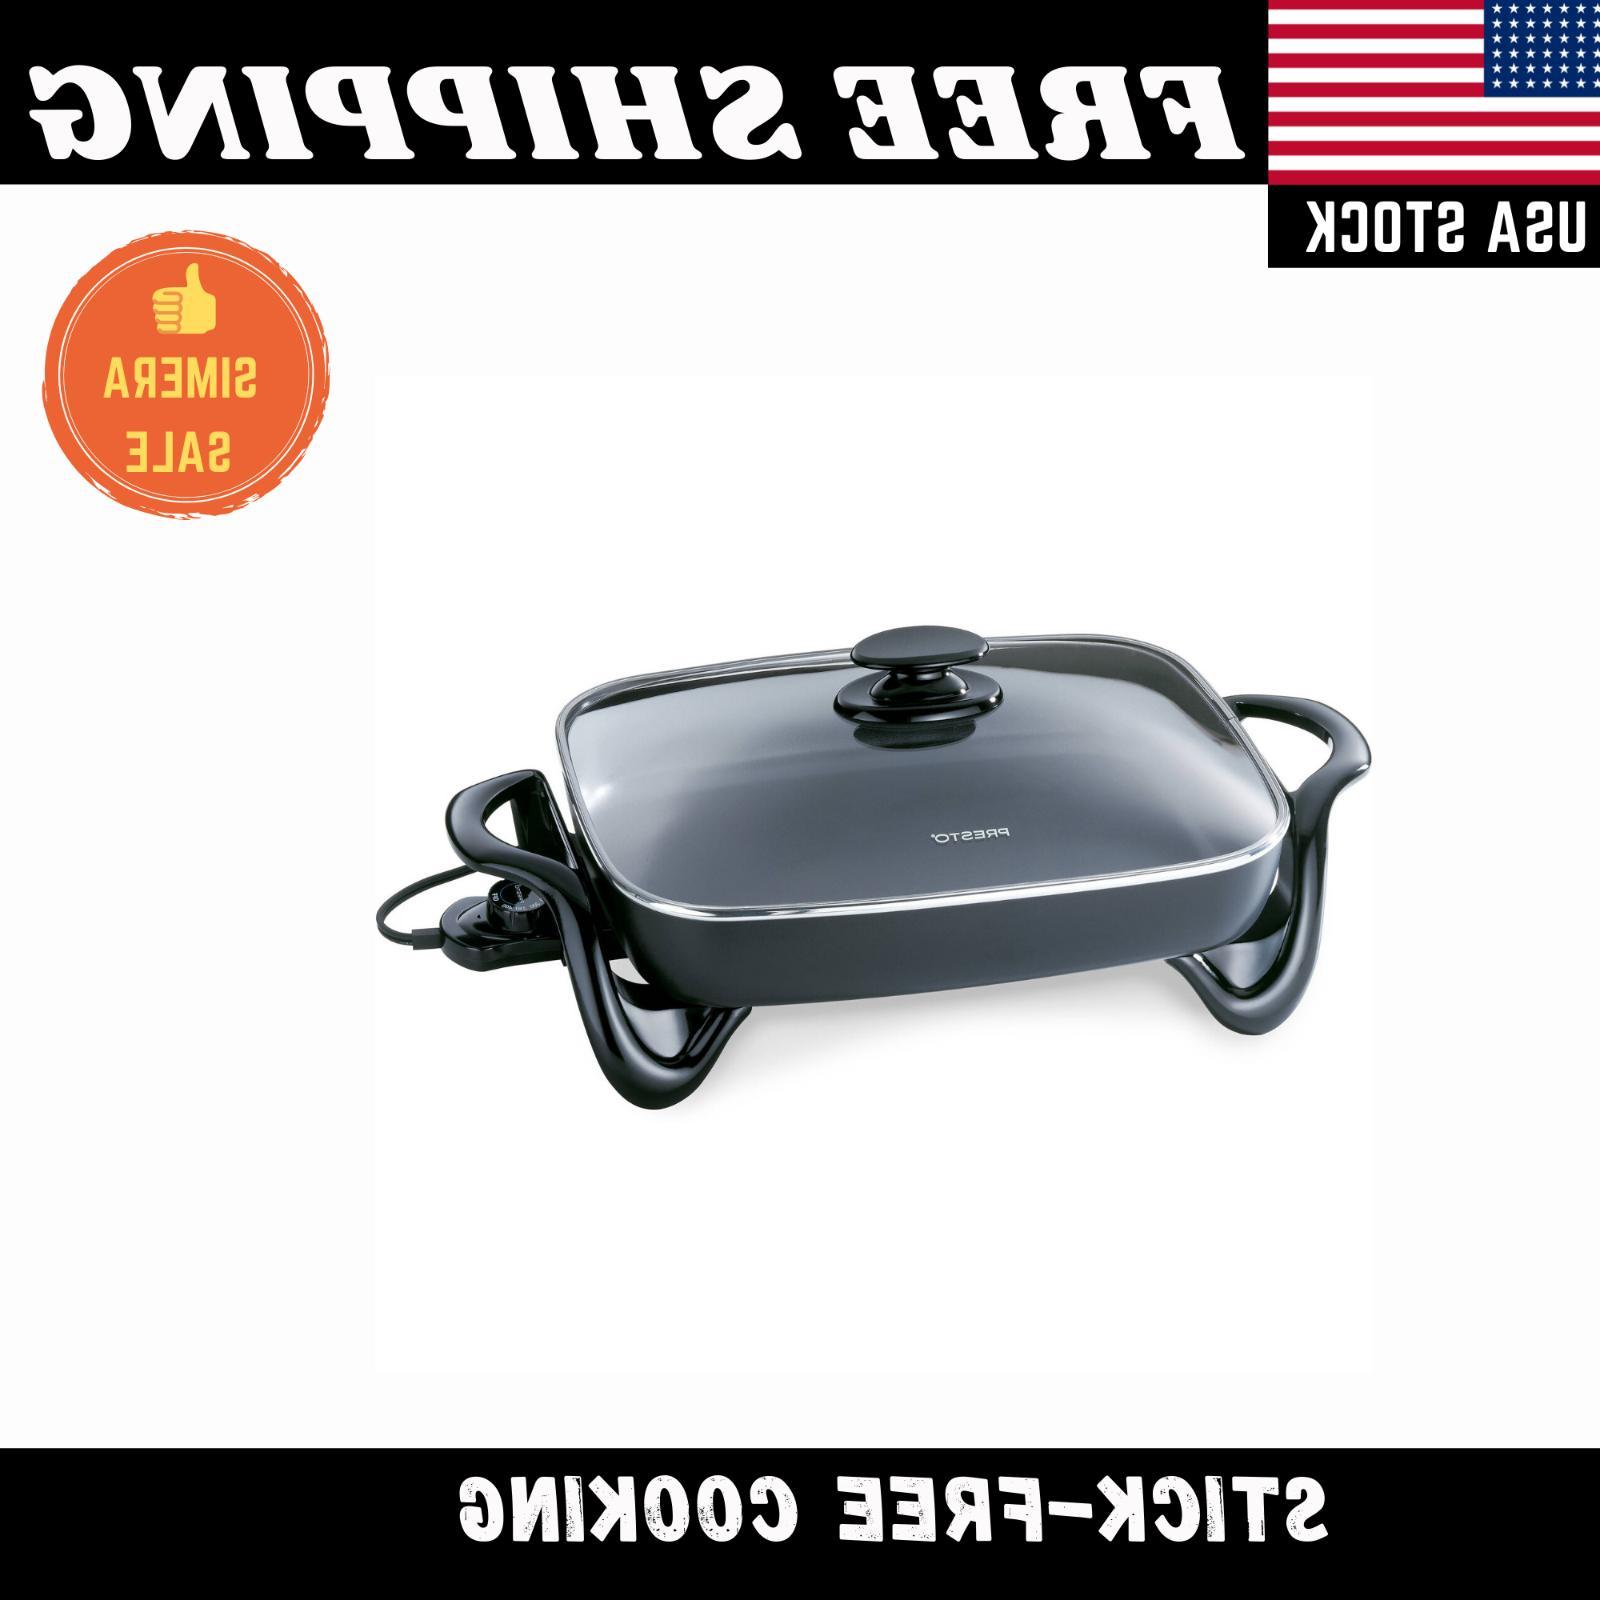 "16"" Electric Frying Server Black"